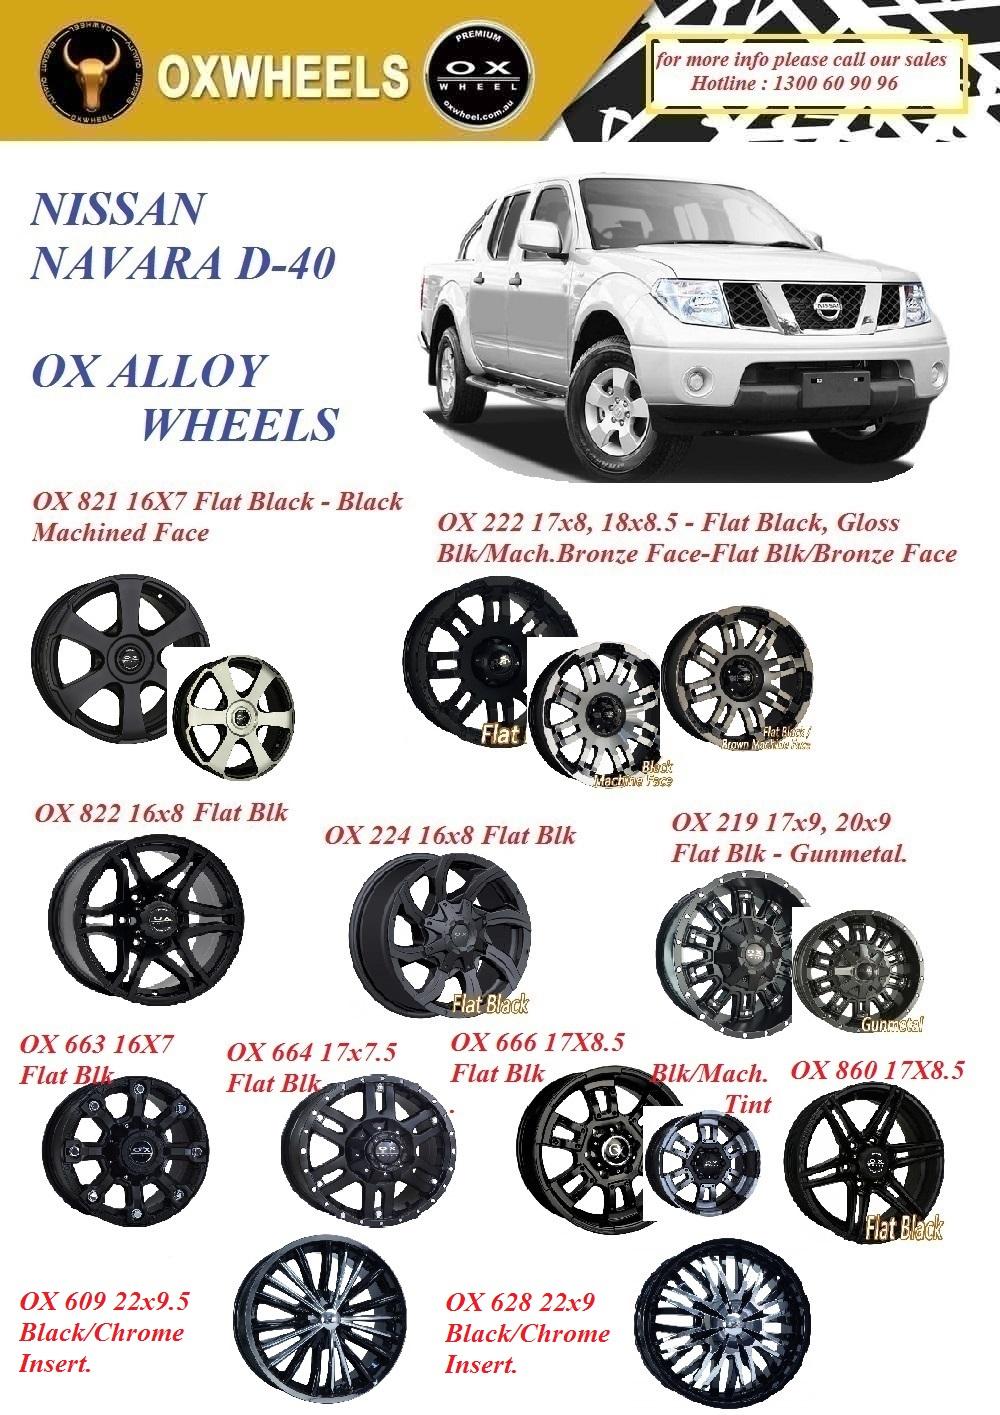 2019 4x4 Wheels